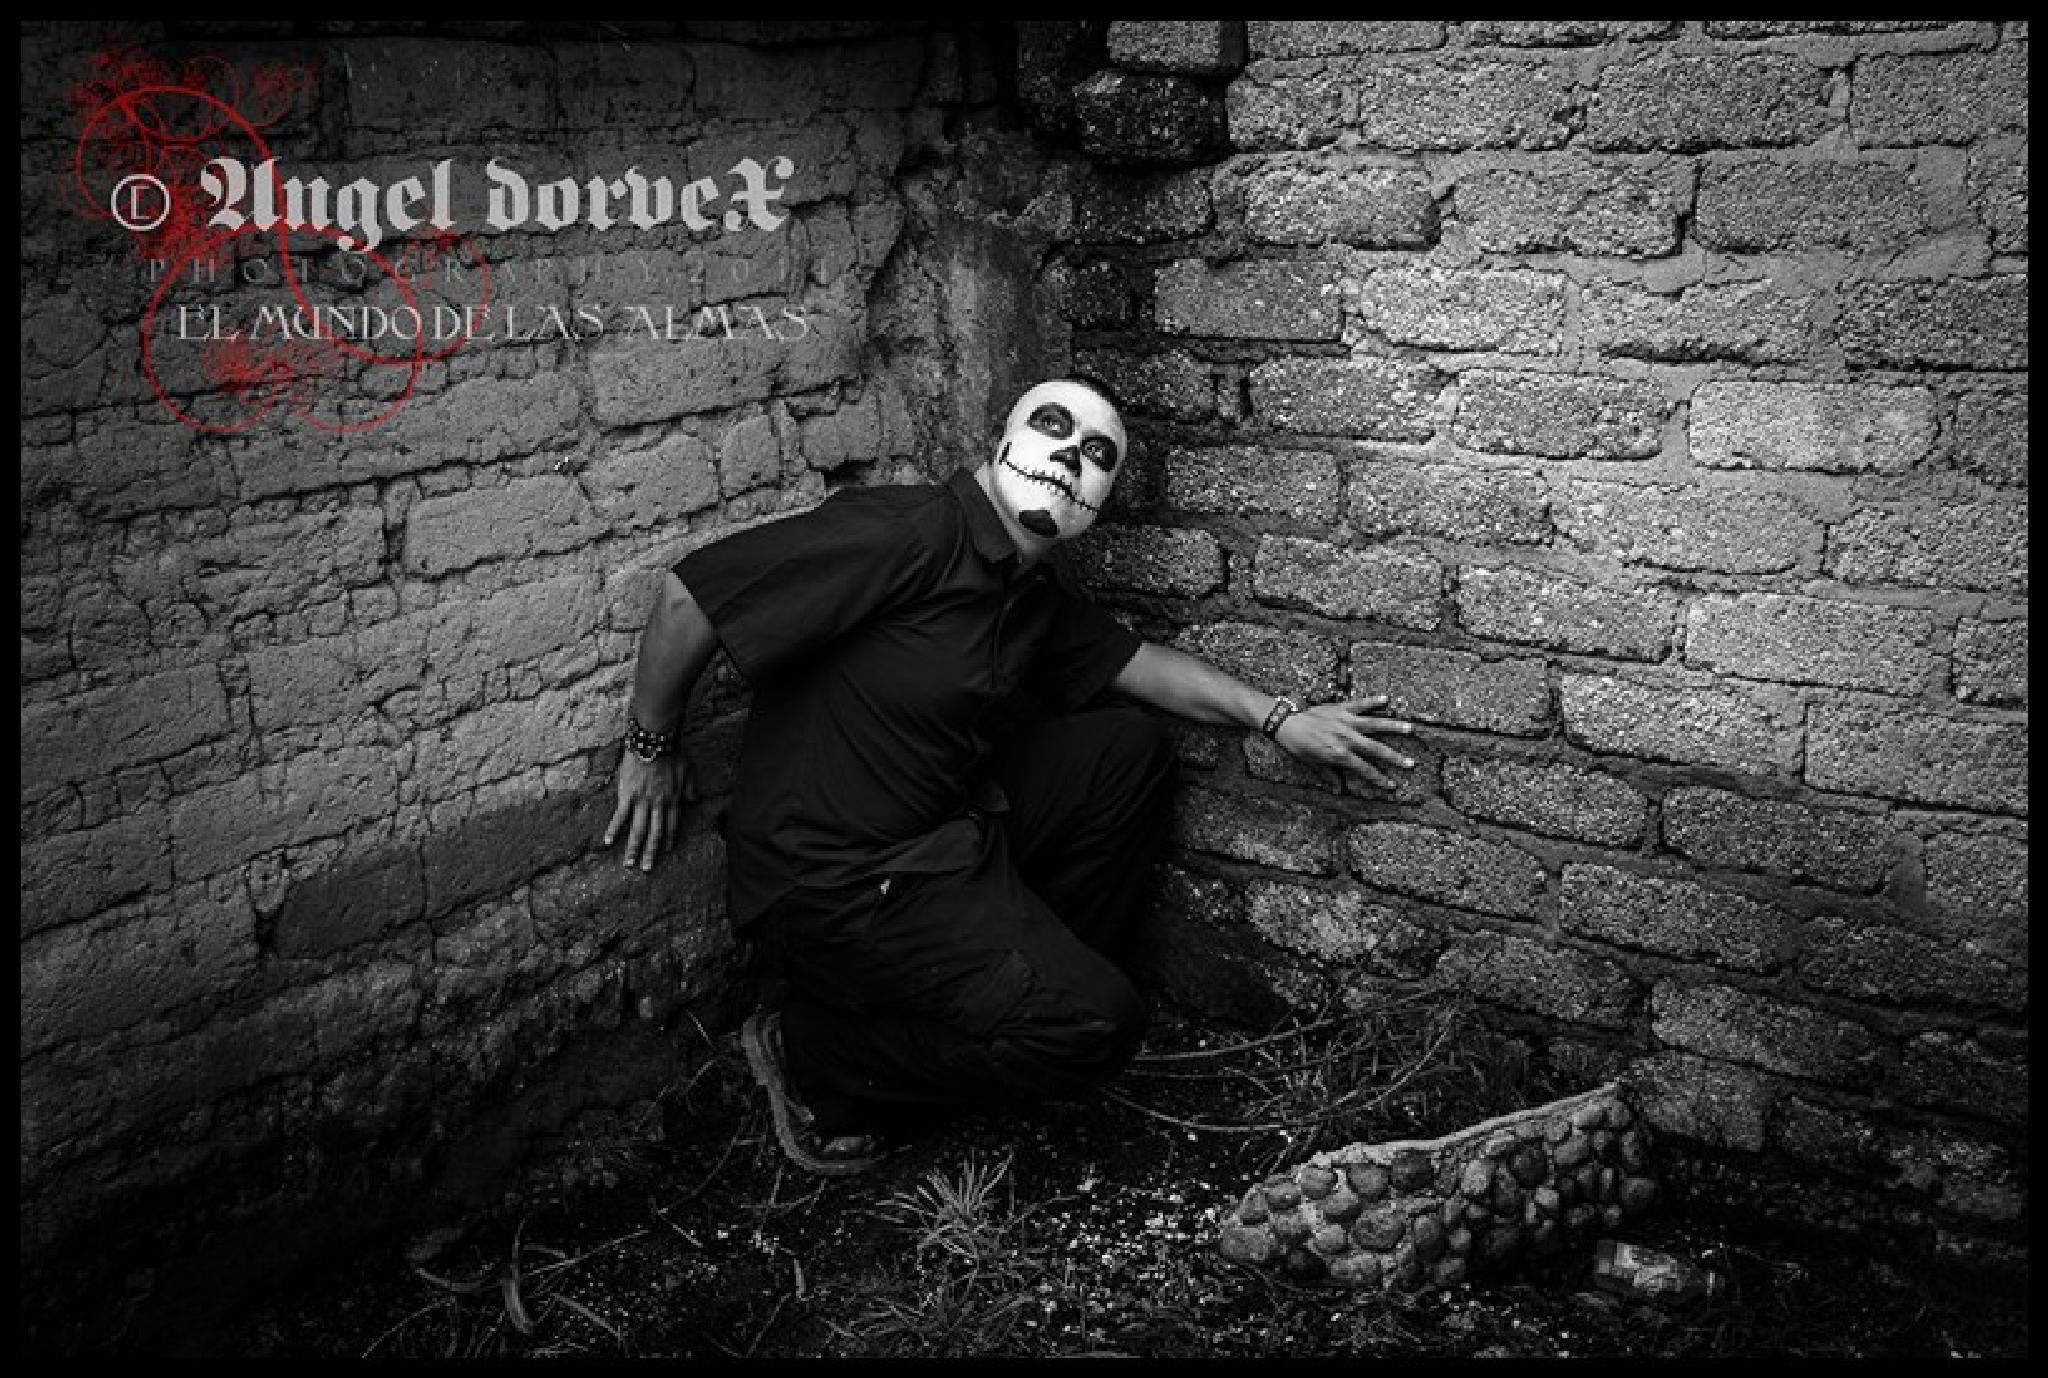 calavera  by angel dorvex